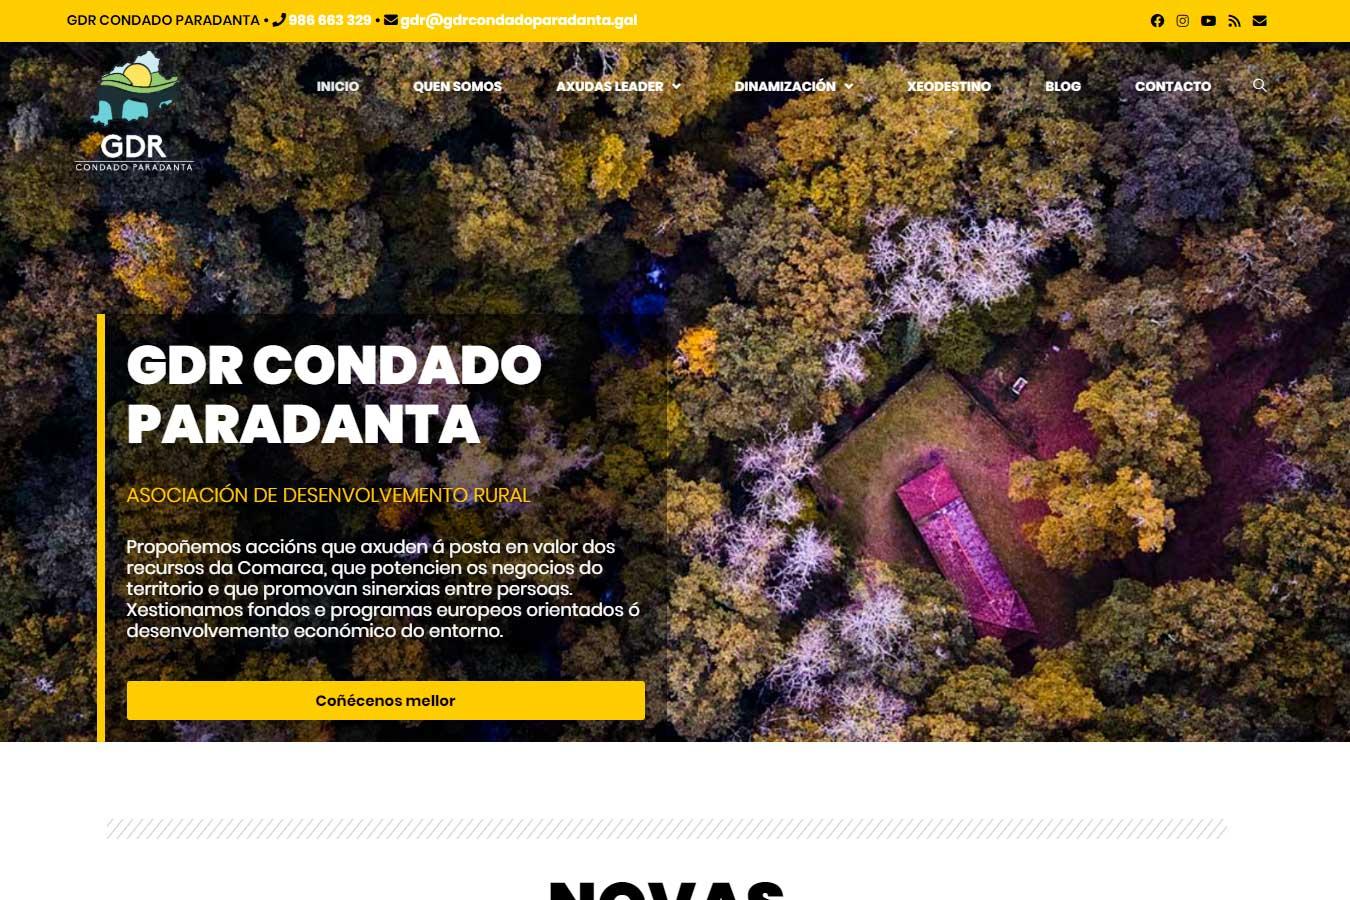 Presentamos a nova páxina web do GDR Condado Paradanta